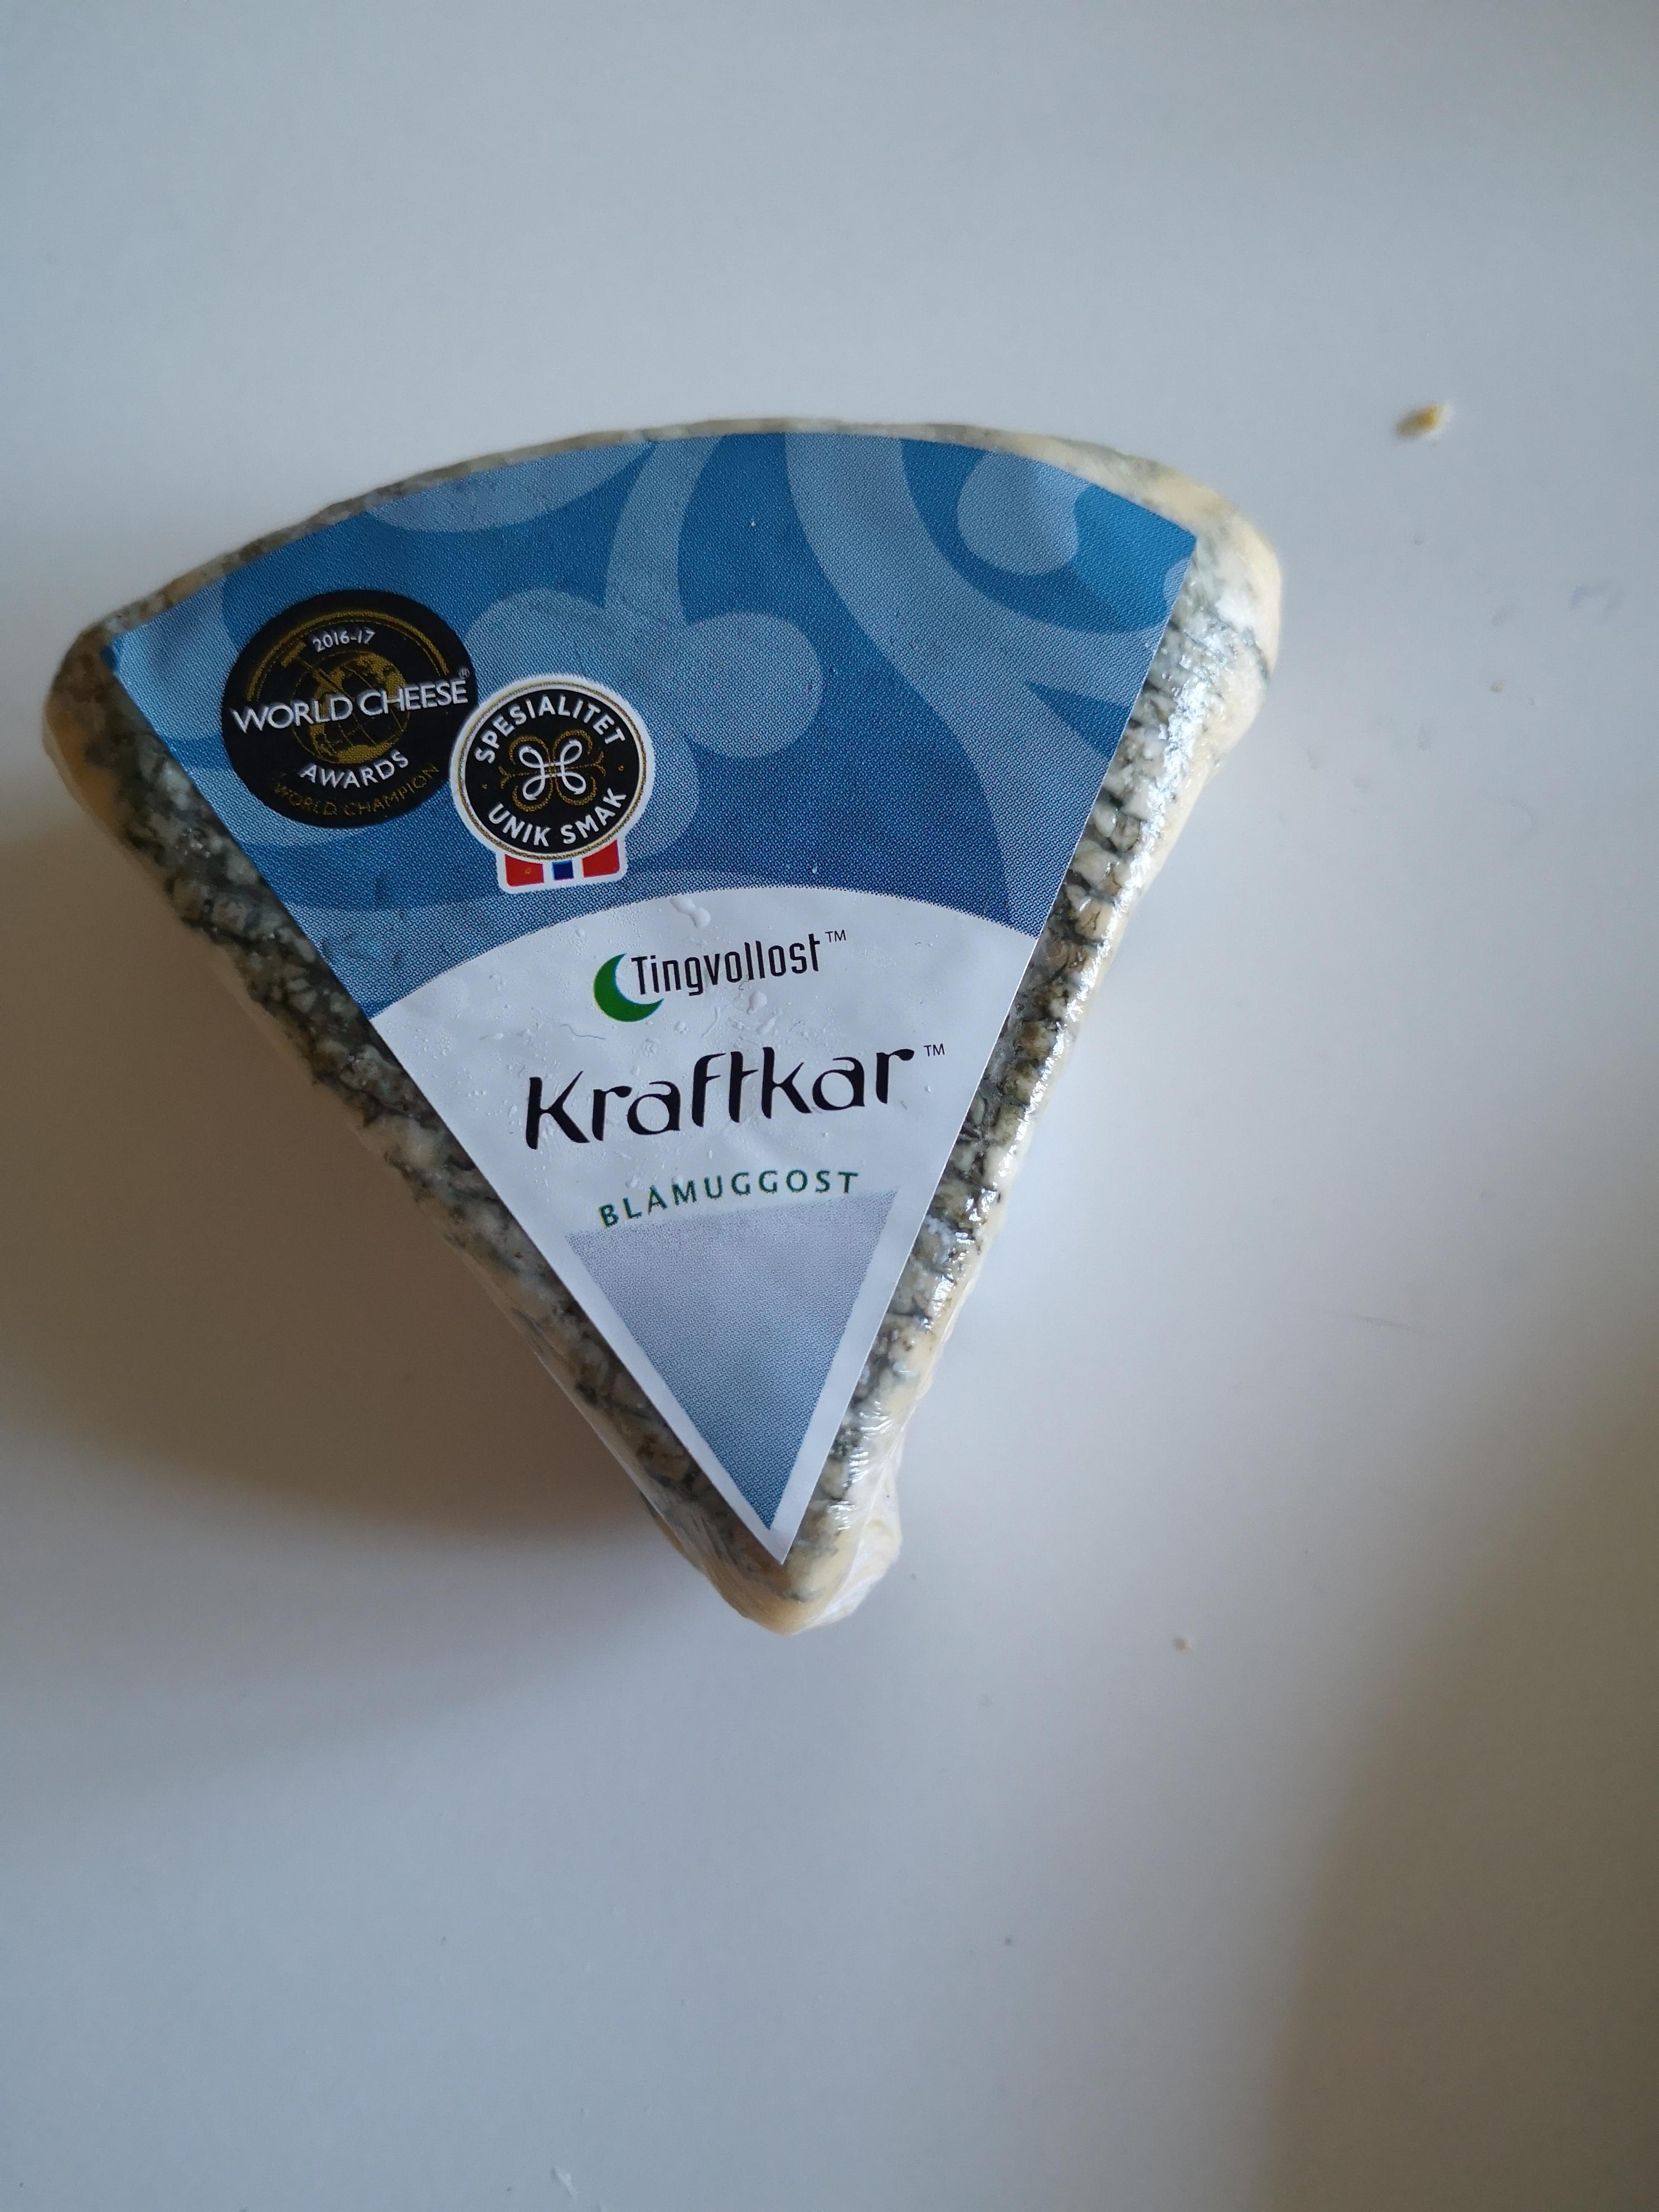 Kraftkar